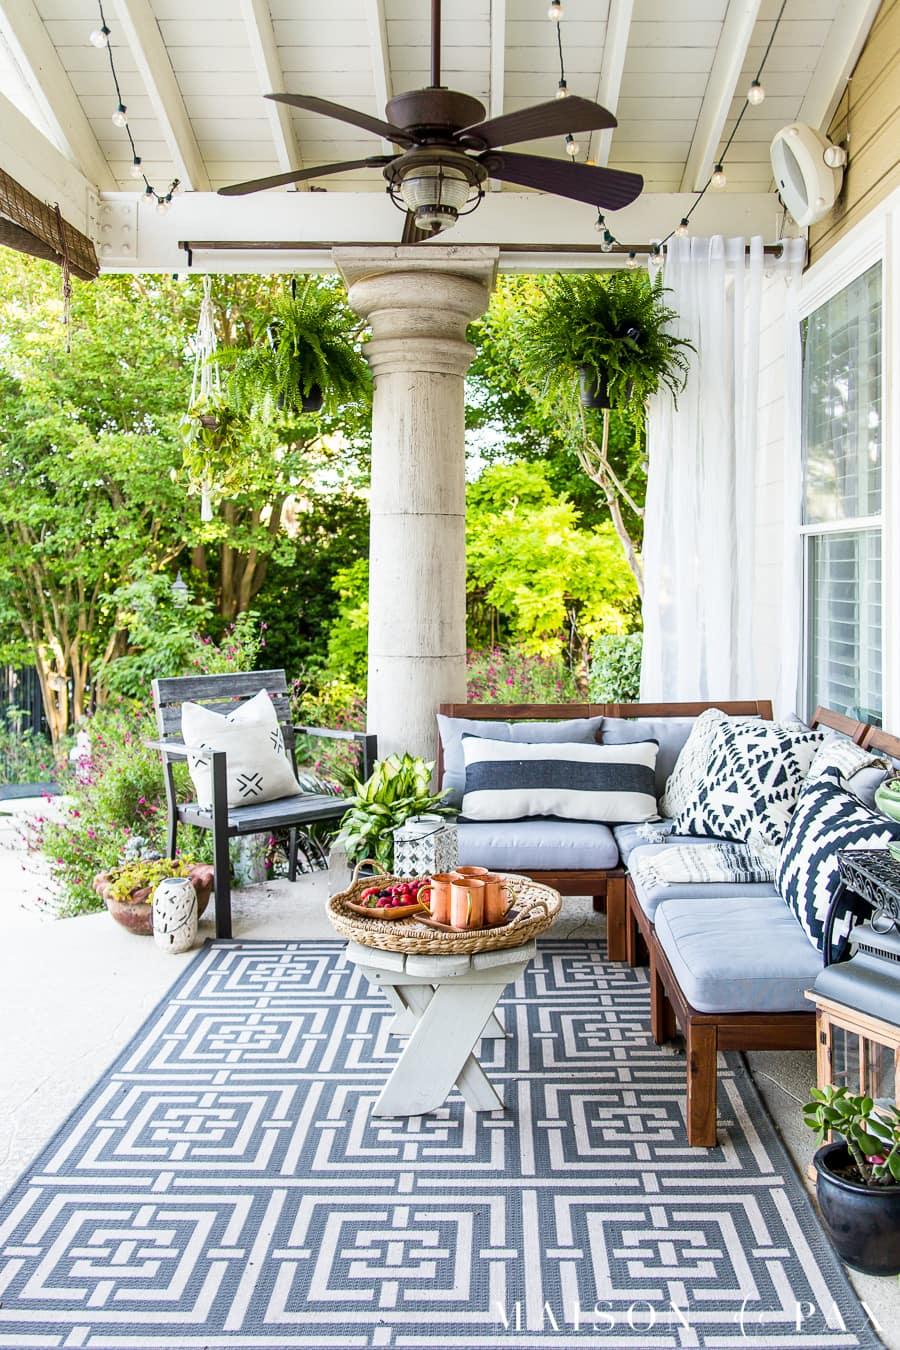 Summer Porch Decor Ideas: Ferns and Succulents - Maison de Pax on Black And White Backyard Decor  id=66919